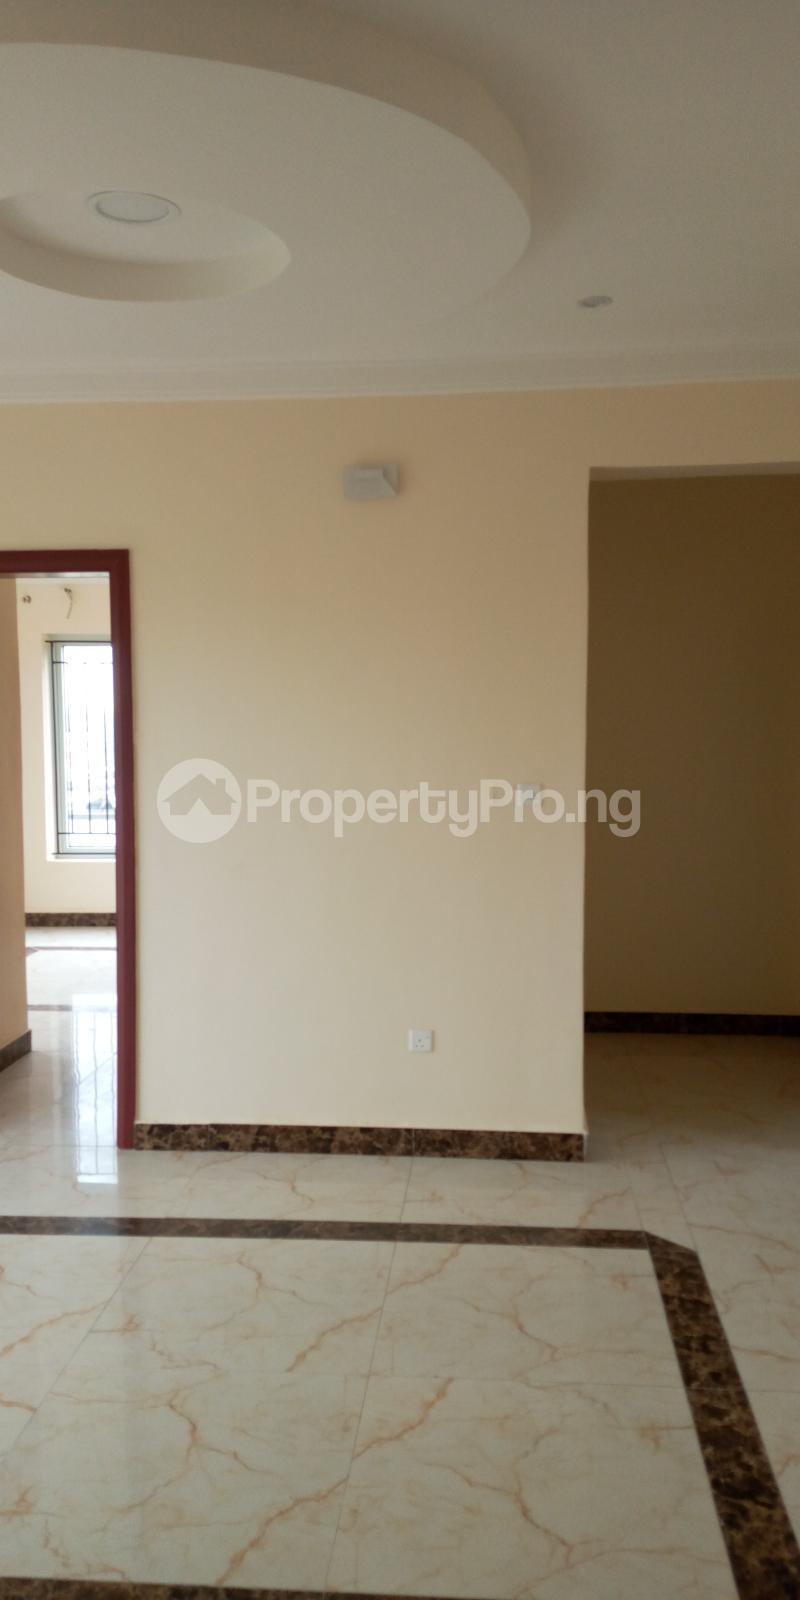 5 bedroom Detached Duplex House for rent Peace Gardens Estate Monastery road Sangotedo Lagos - 6